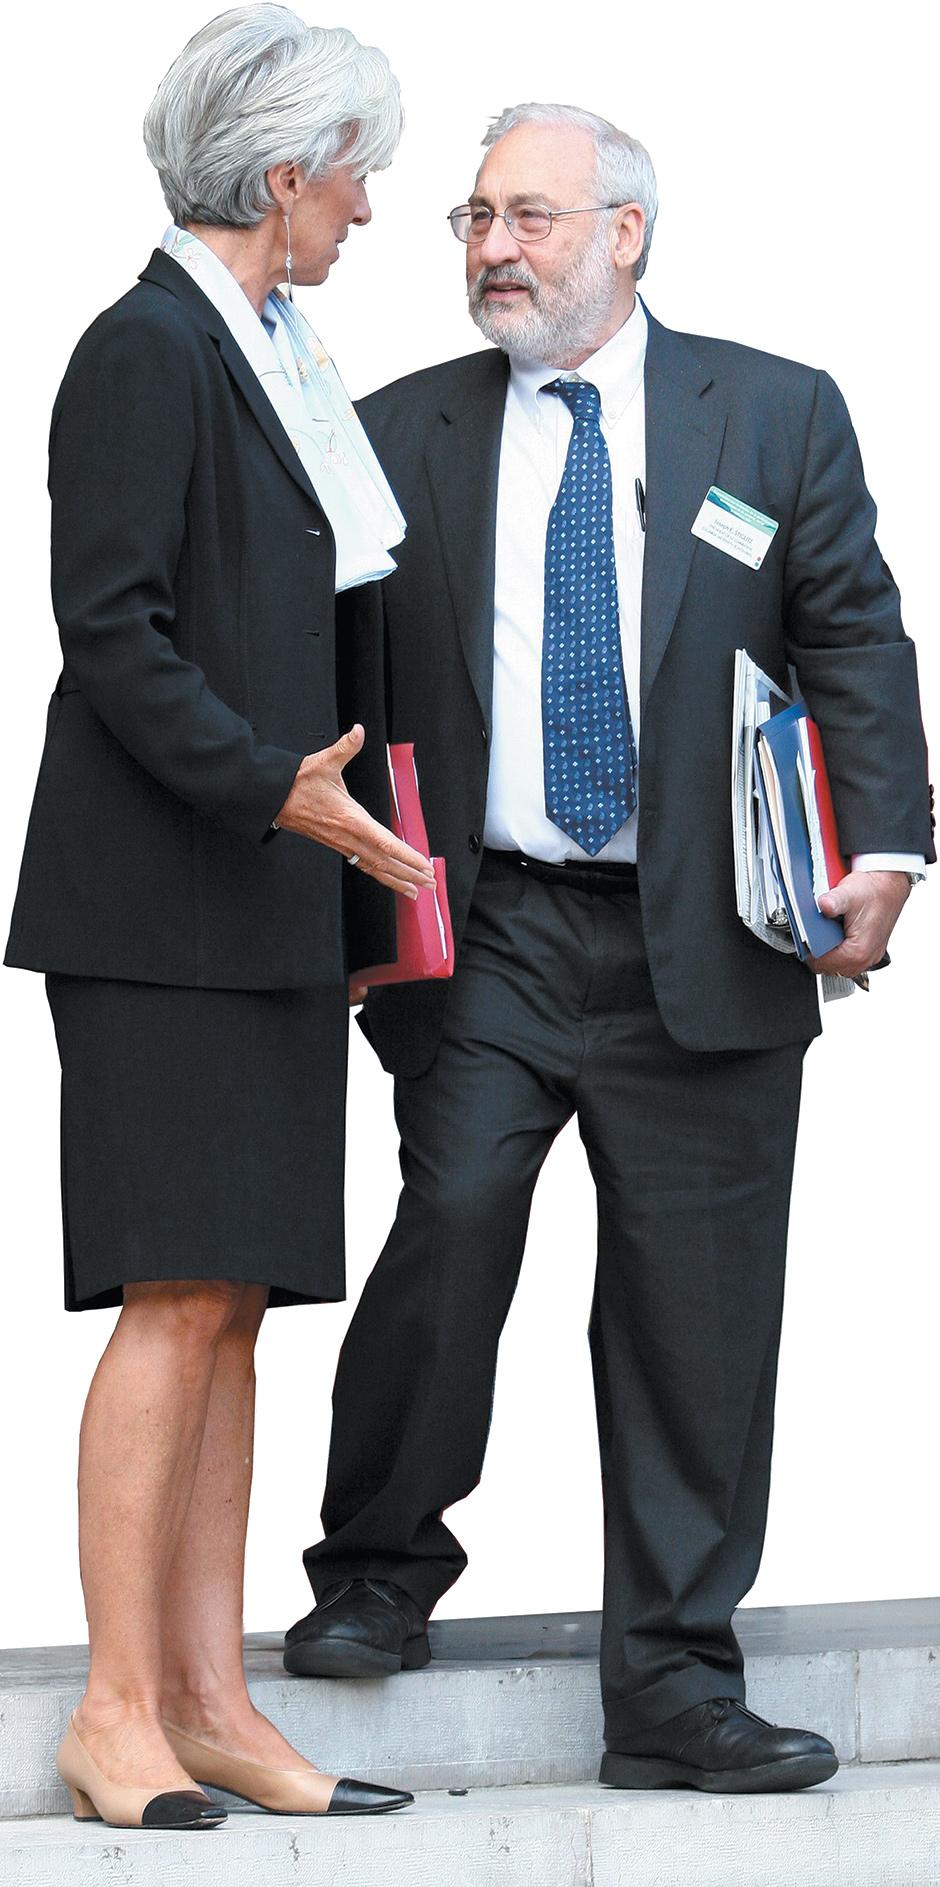 Joseph Stiglitz with Christine Lagarde,Paris, September 2009